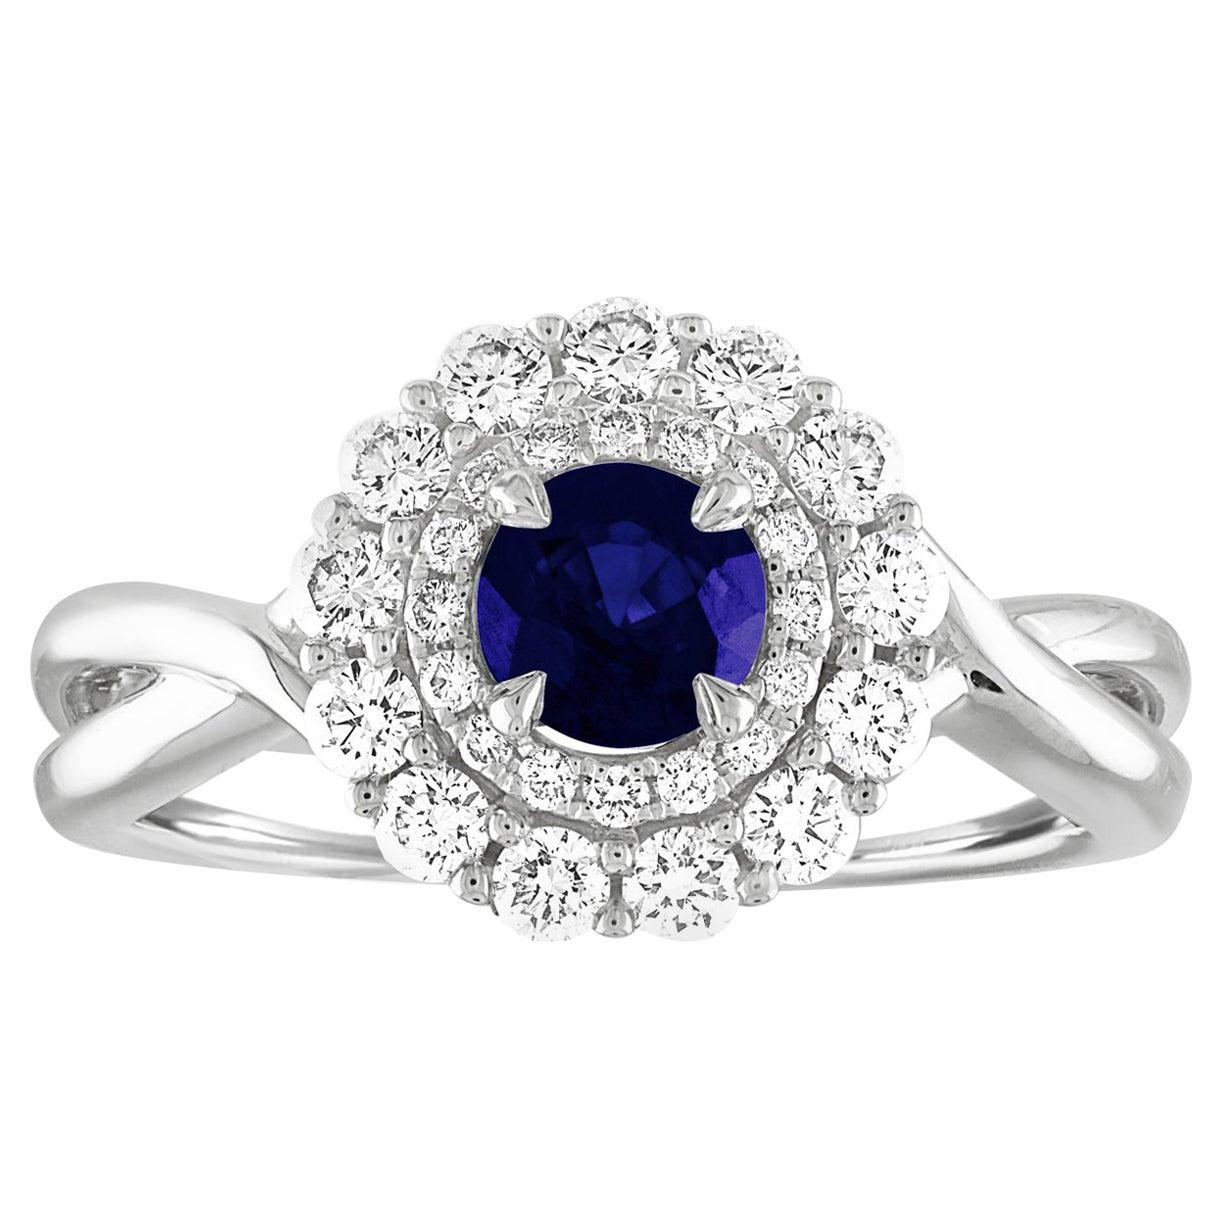 AGL Certified 0.84 Carat Round Sapphire Diamond Gold Ring